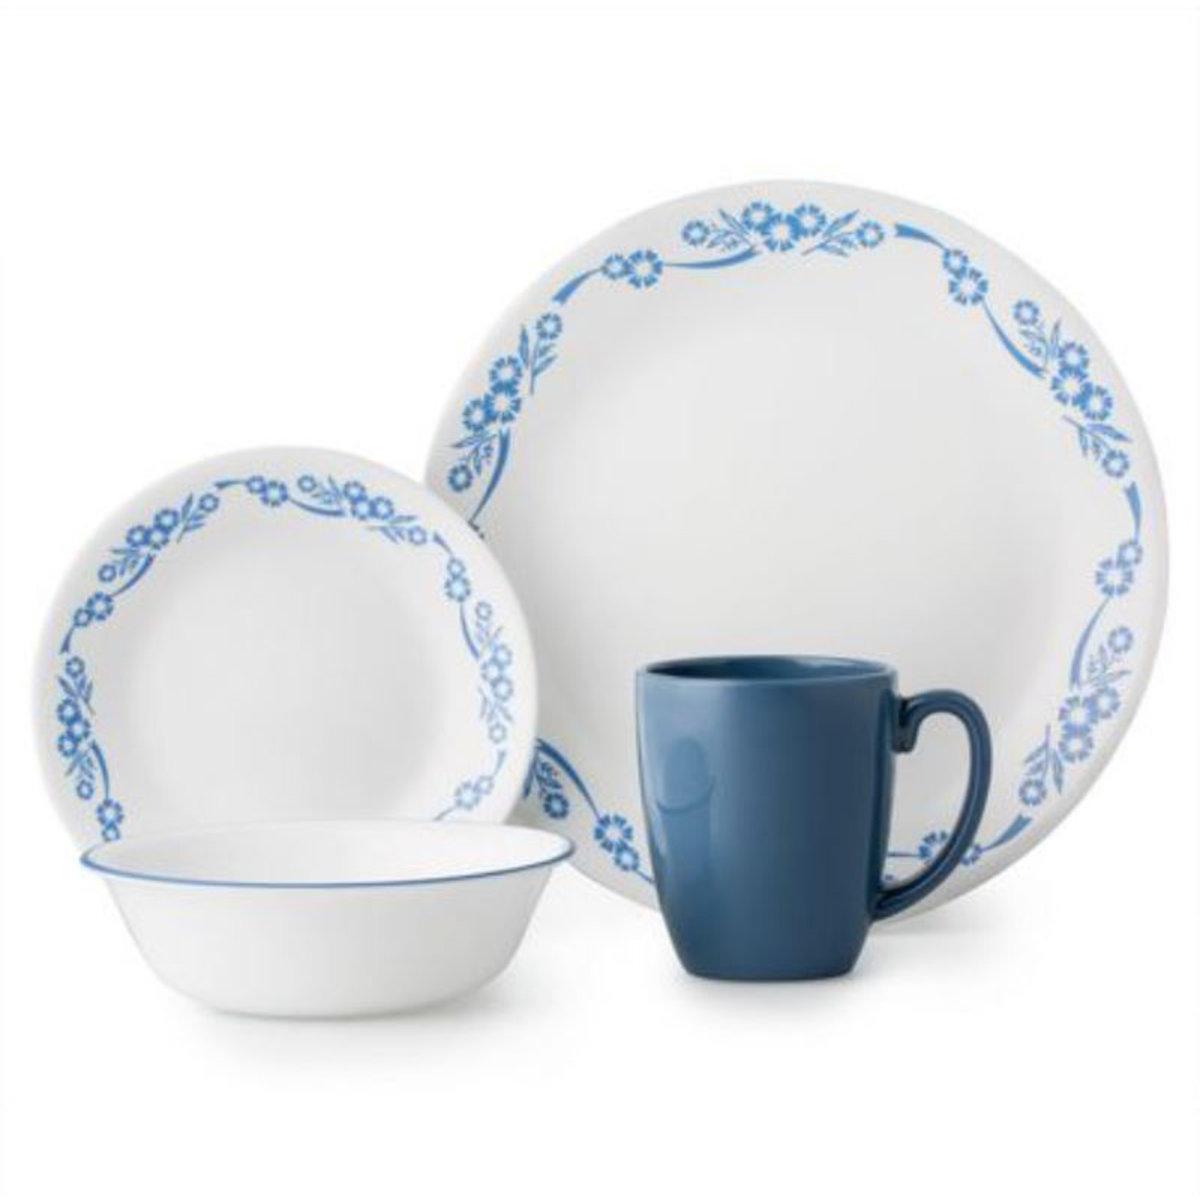 16-pc Dinnerware Set - Cornflower (Parallel Import goods)